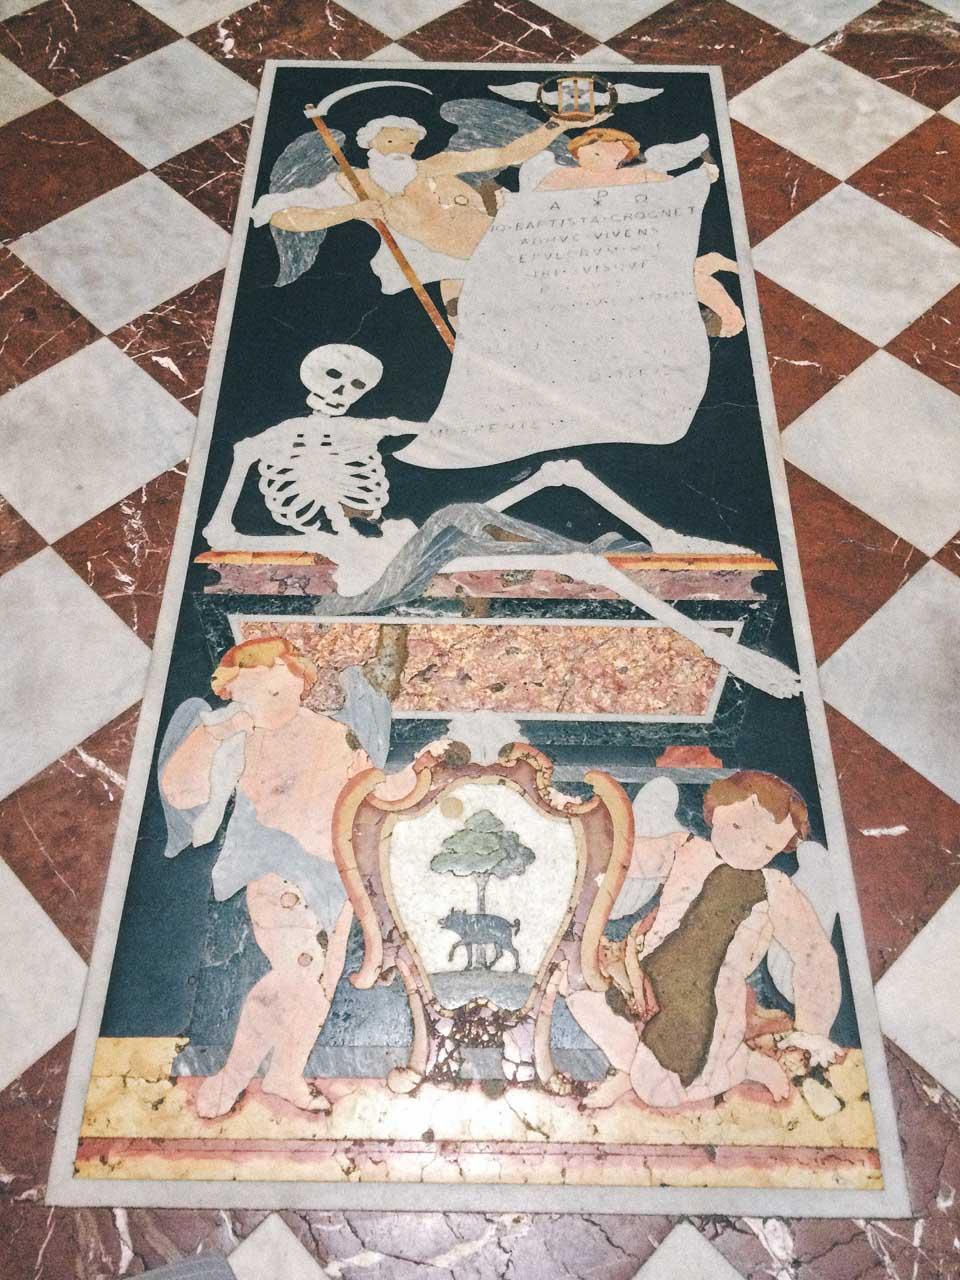 Tiles in the Collegiate Parish Church of St. Paul's Shipwreck in Valletta, Malta